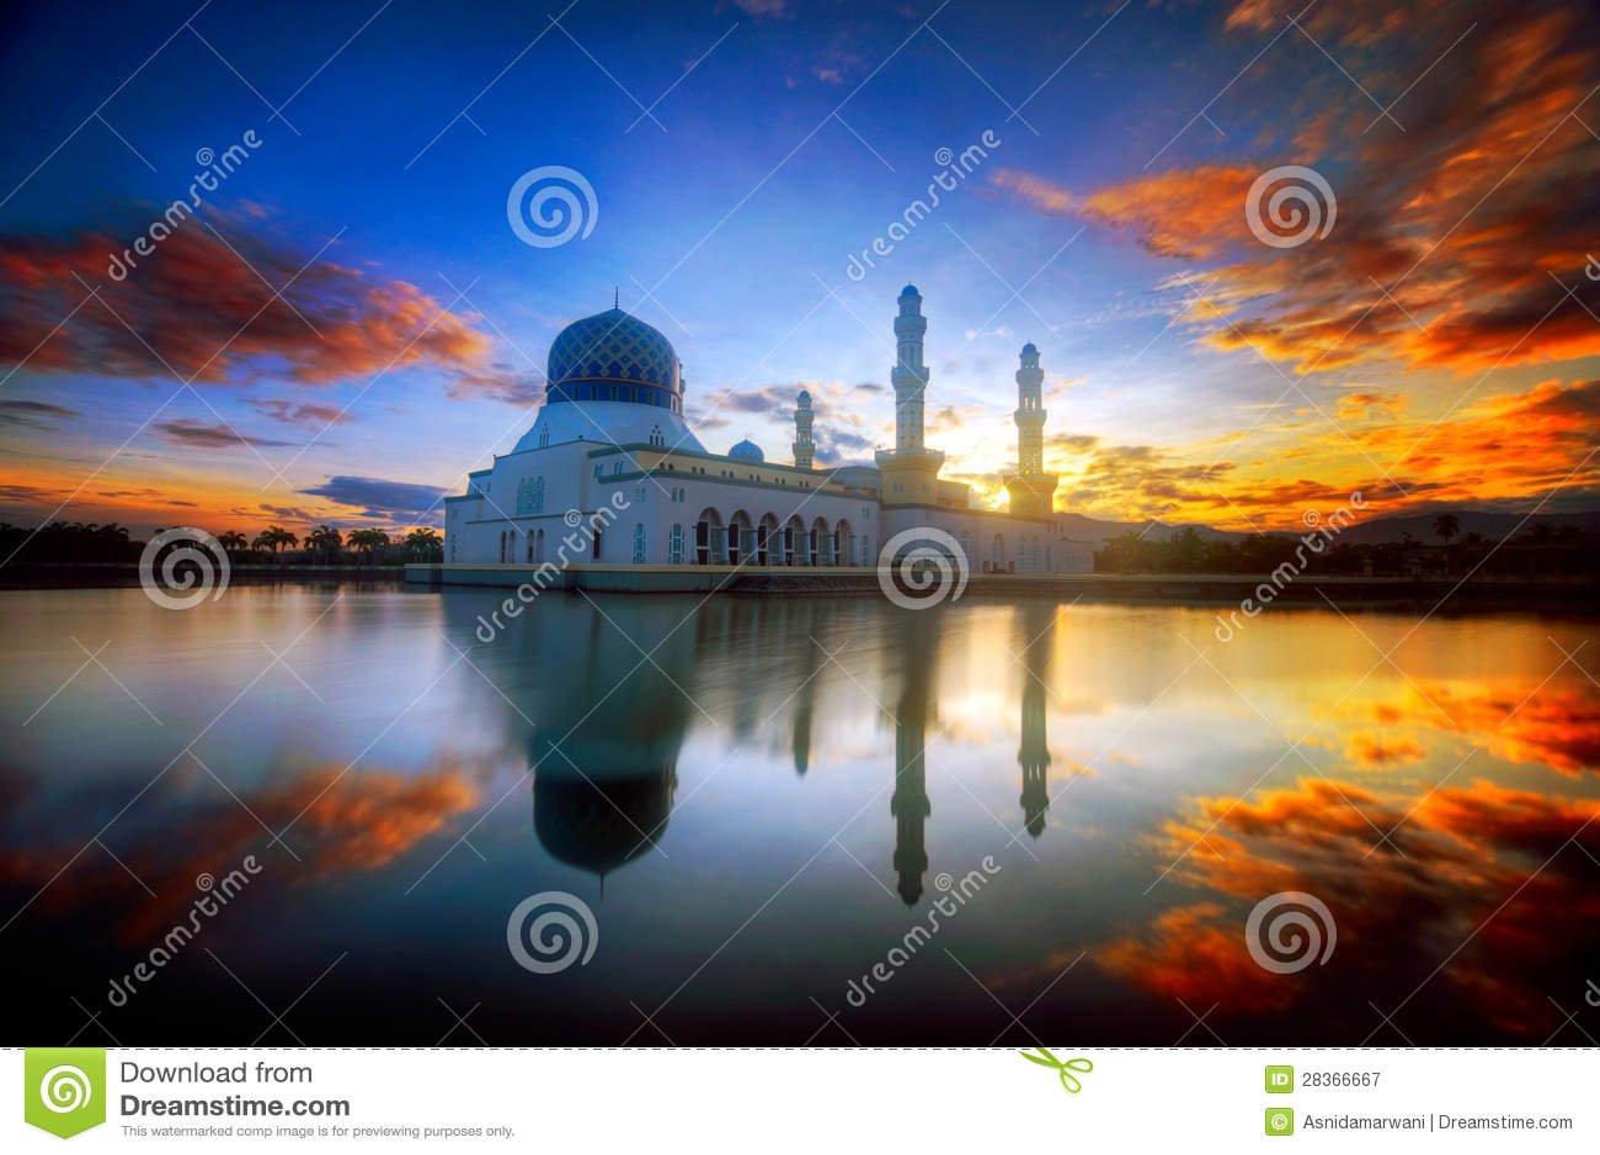 Mesquita de Malaysia Bornéu Kota Kinabalu Likas